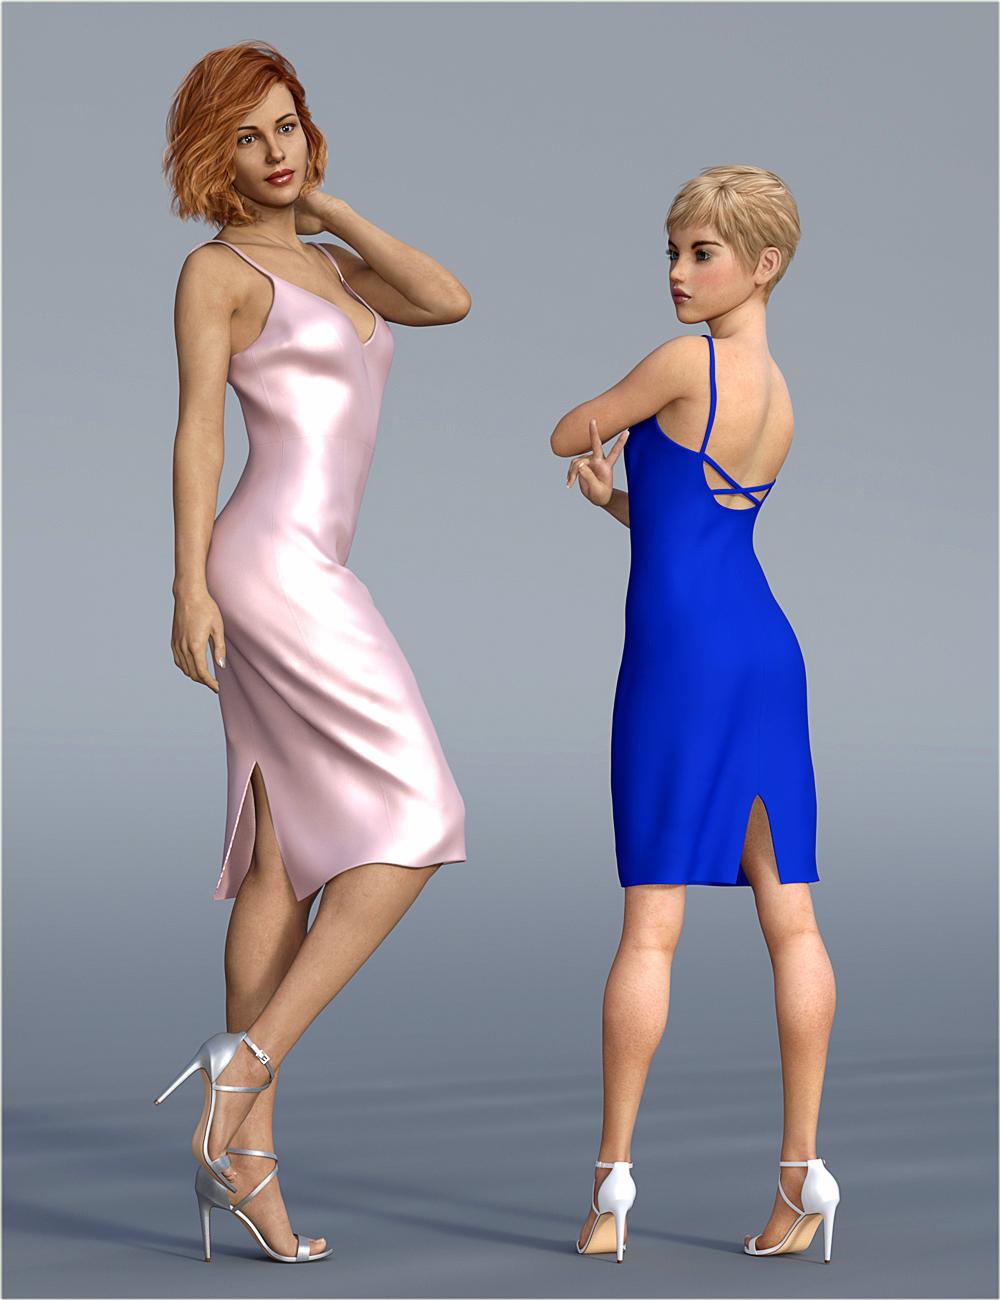 dForce H&C Open Back Dress for Genesis 8 Female(s) by: IH Kang, 3D Models by Daz 3D